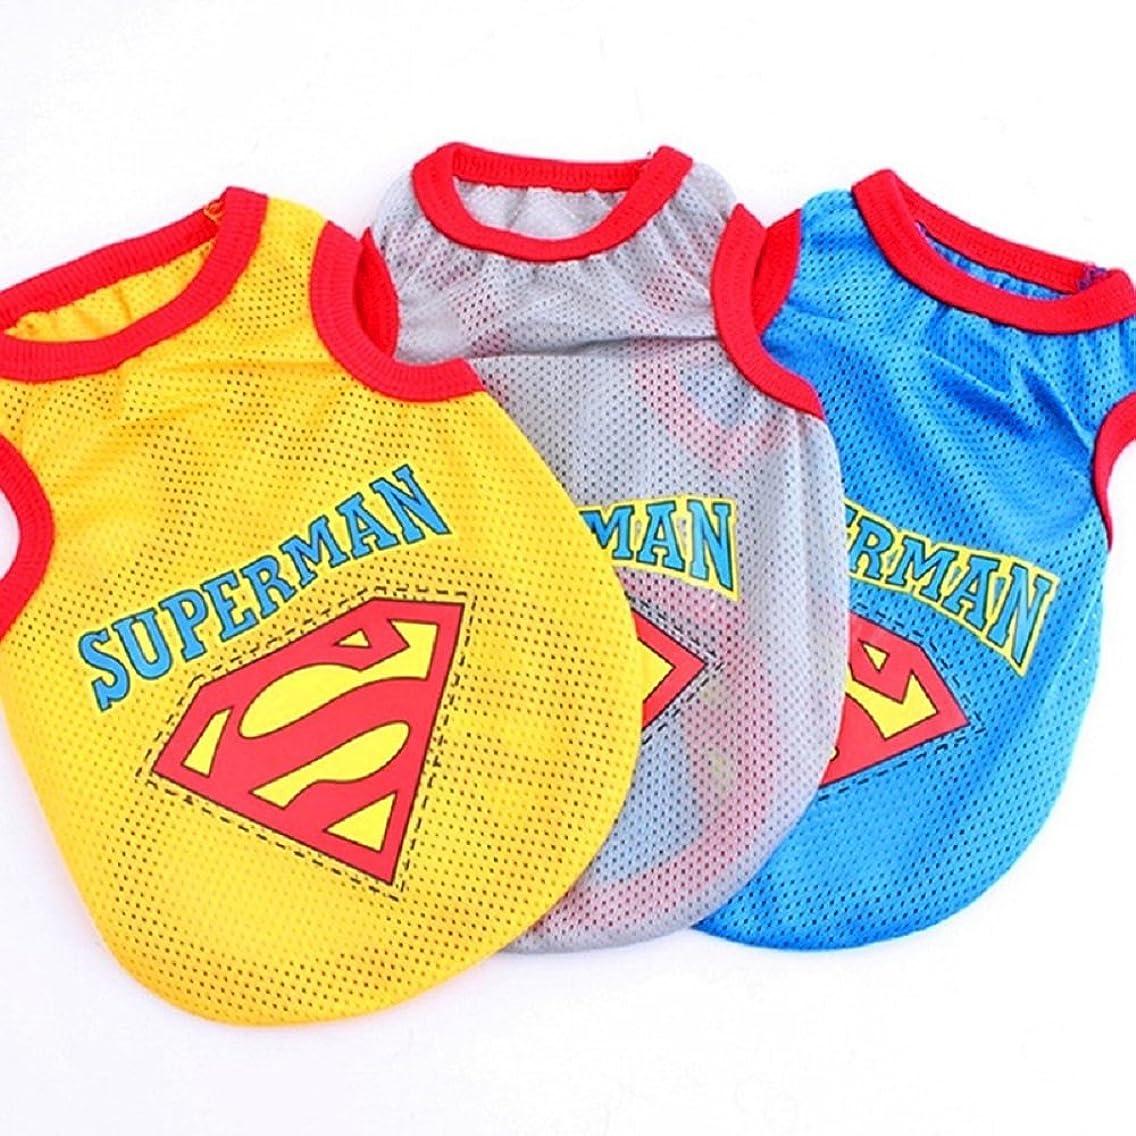 Superman Shirt Pet Clothes for Dog Cat Puppy Shirt Summer Vest Dogs T-Shirt